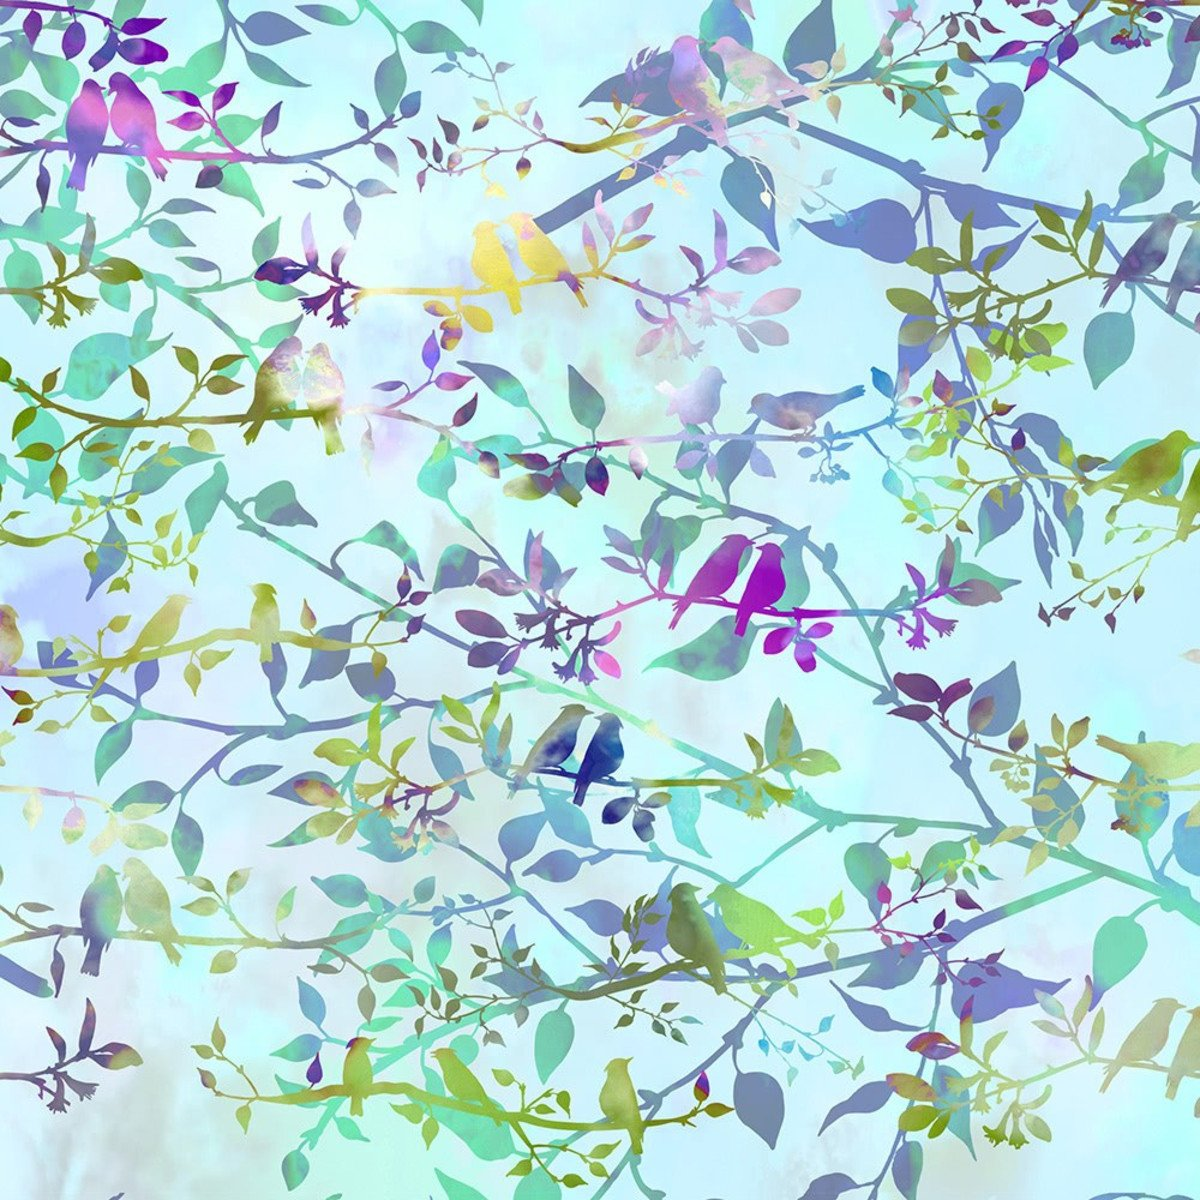 GARDEN OF DREAMS-BIRDS SOFT SKY